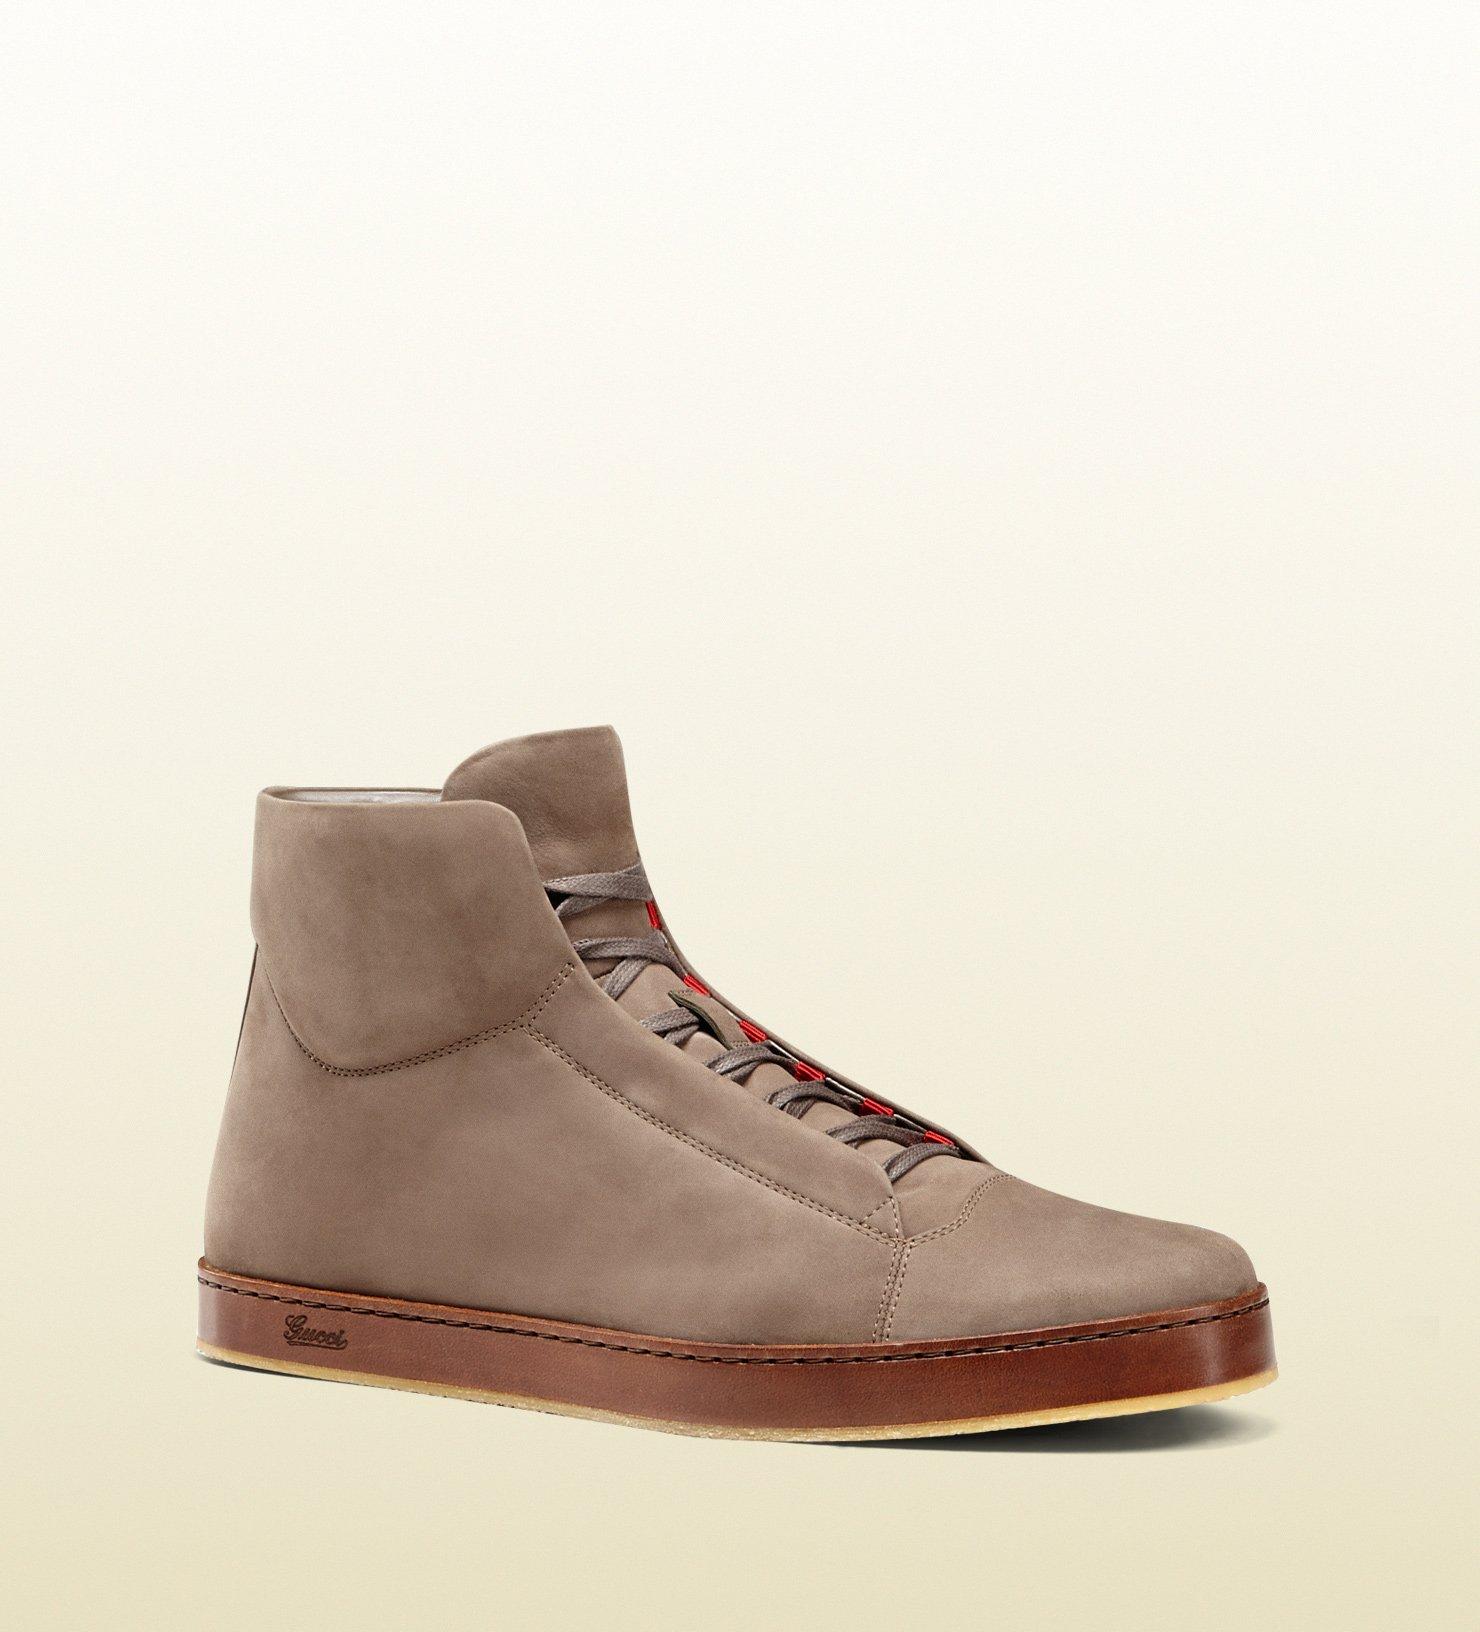 Dc Shoes Brown Suede